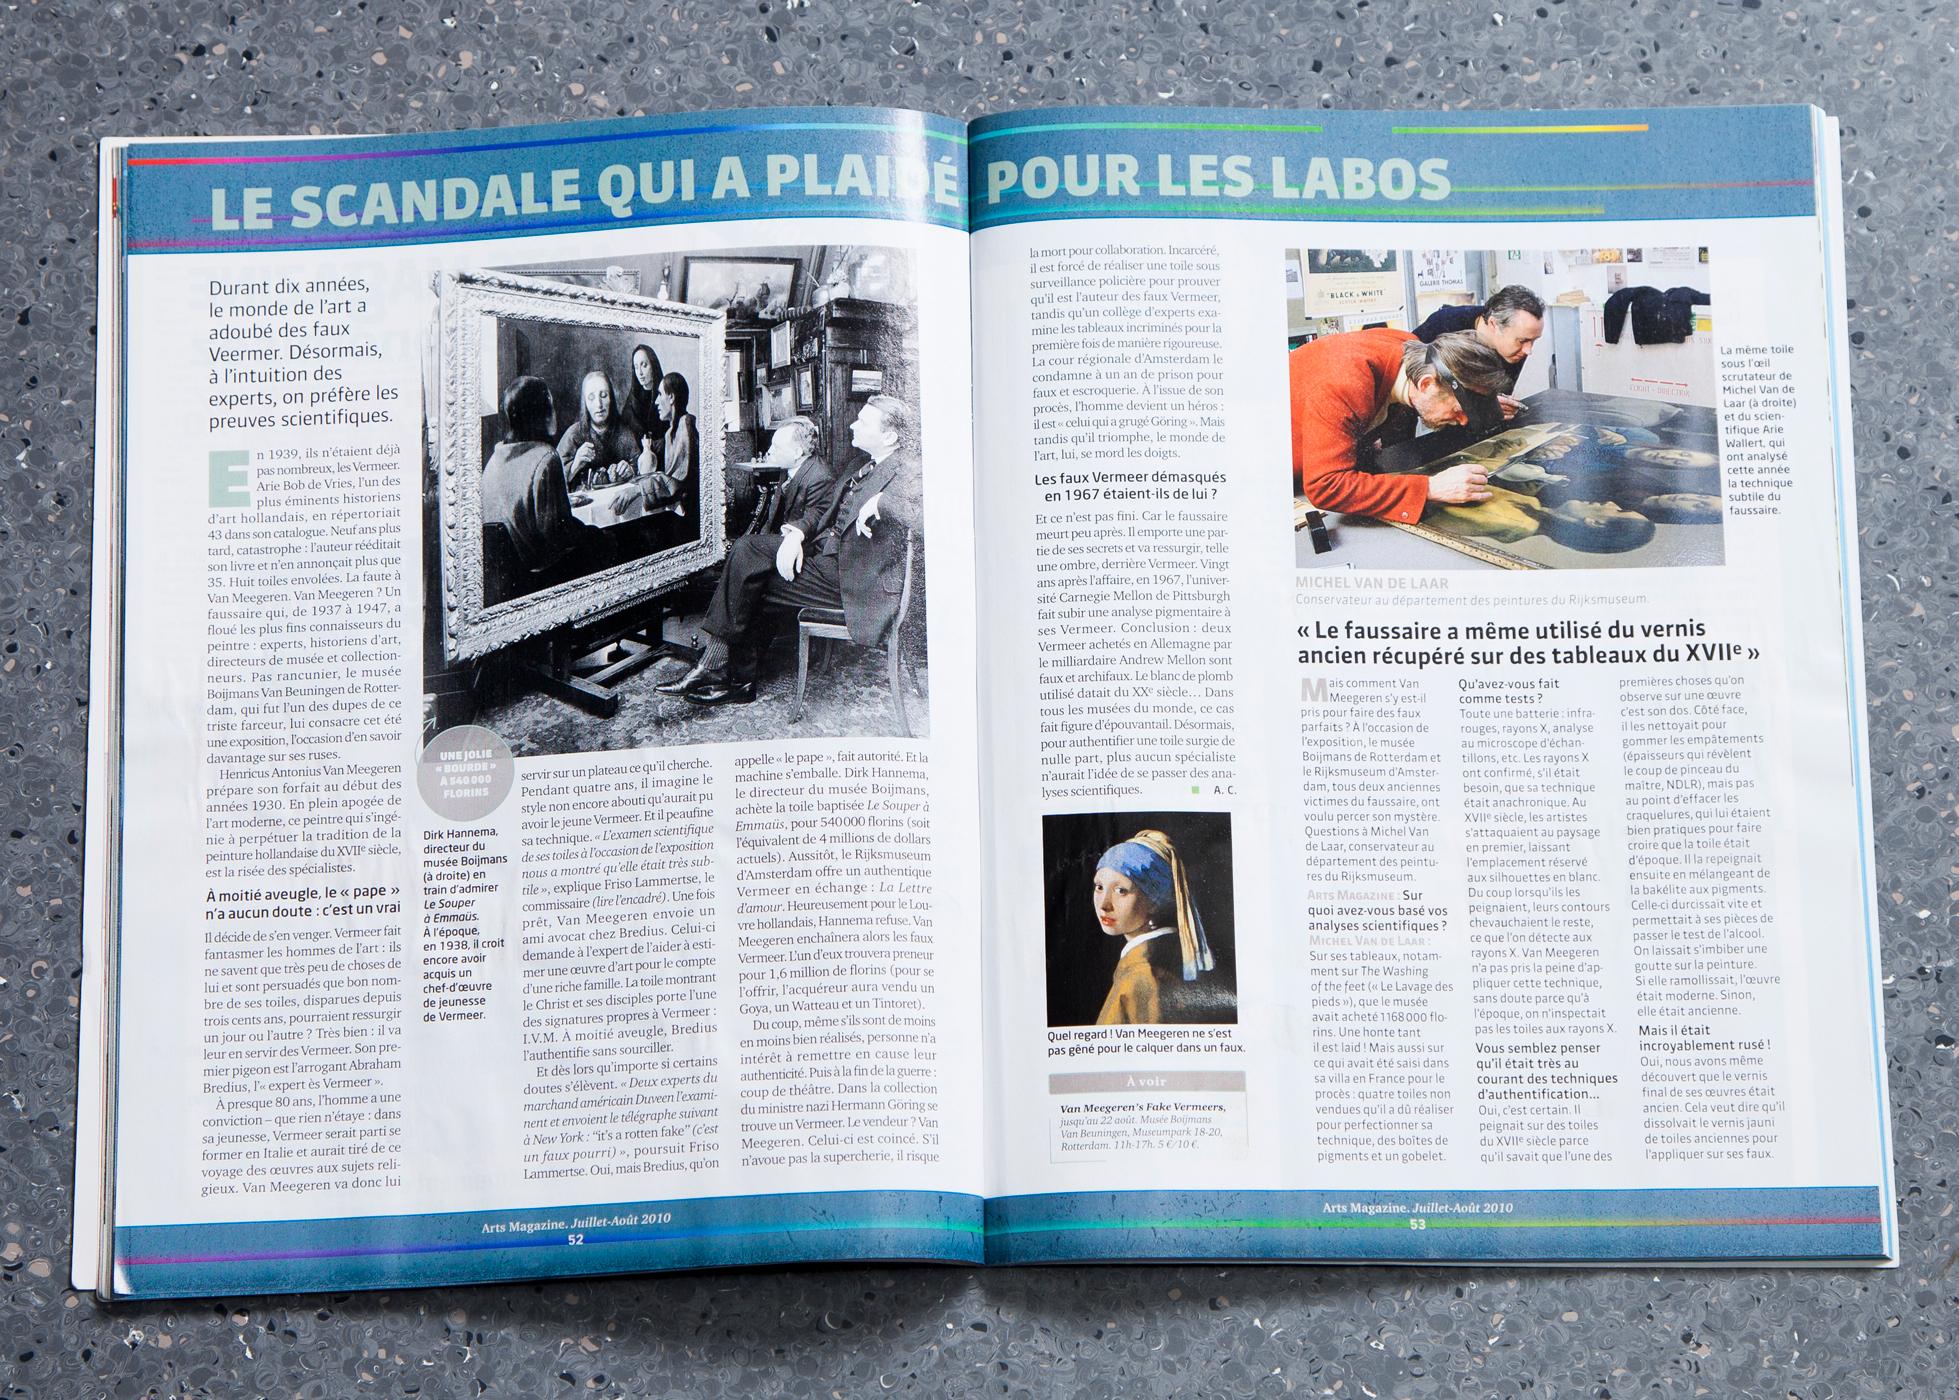 Arts Magazine